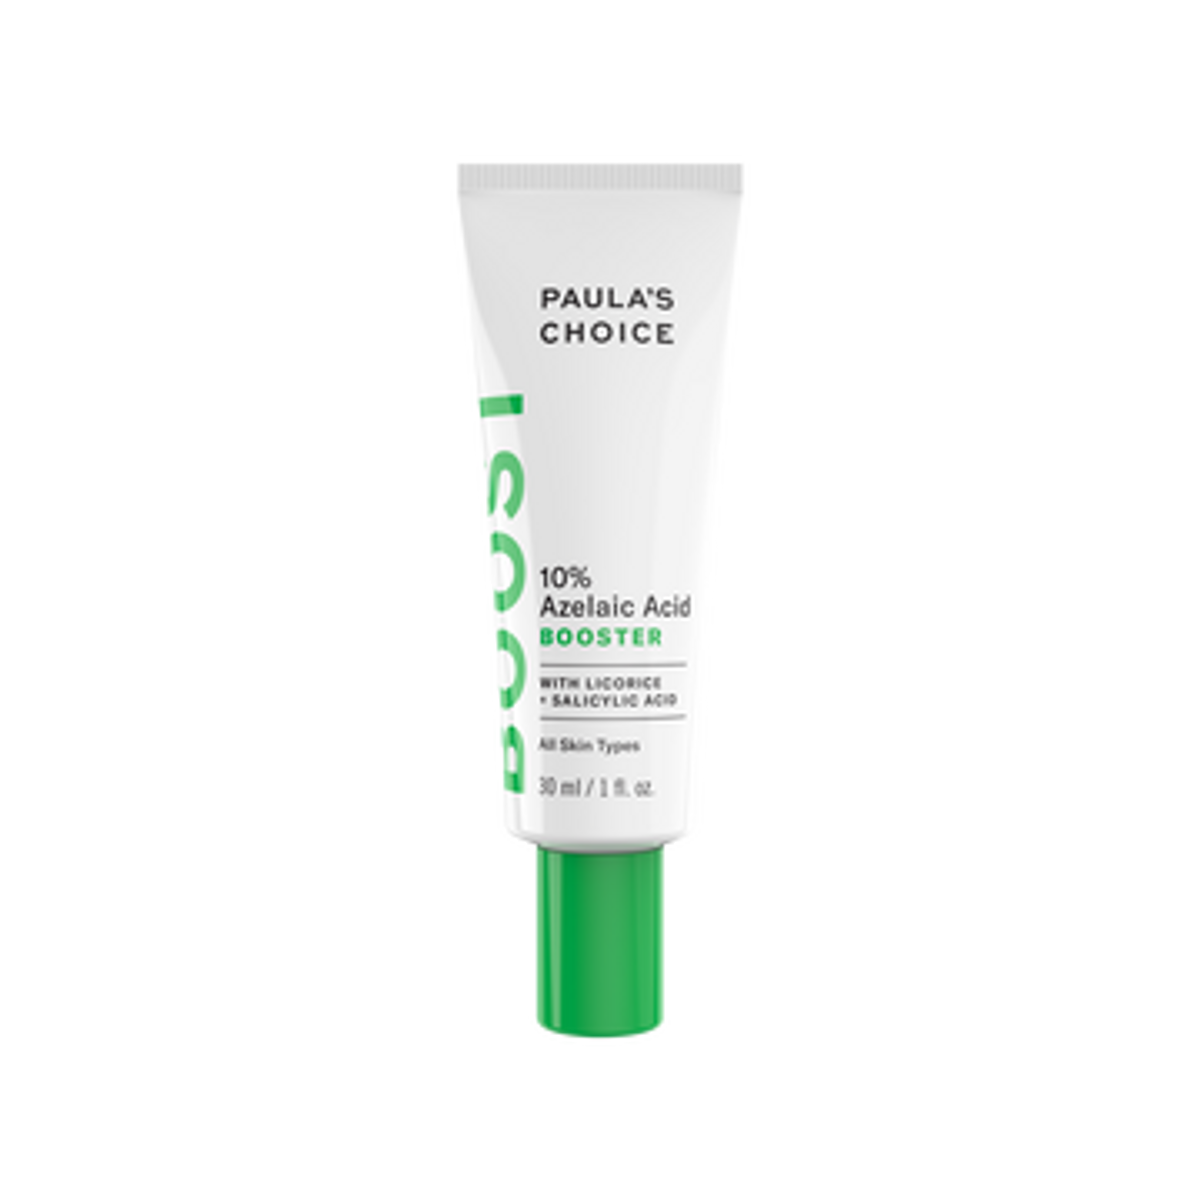 paulas choice skincare 10 percent azelaic acid booster